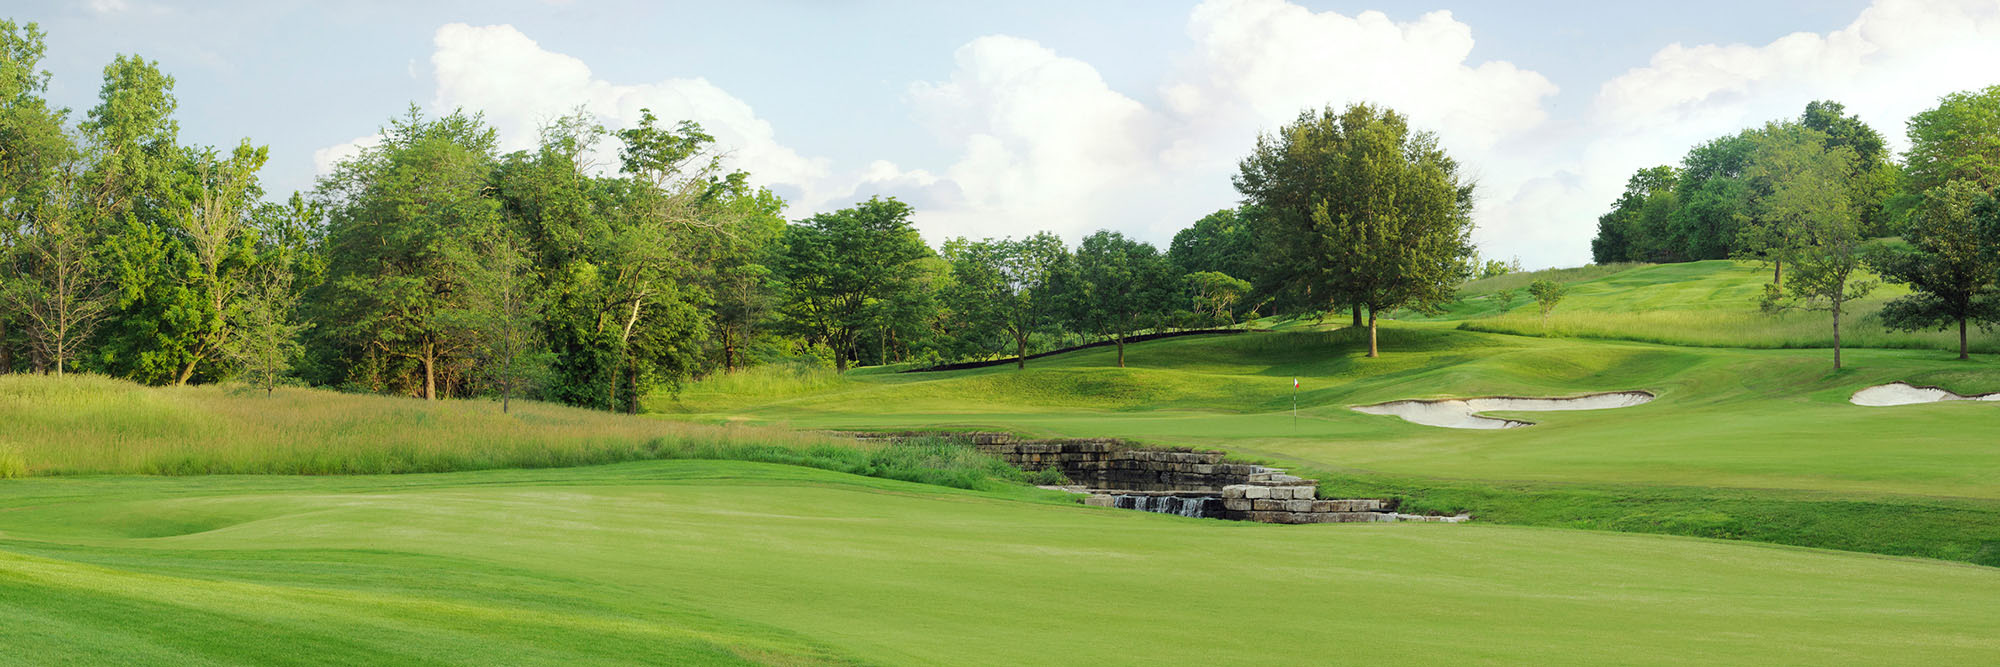 Golf Course Image - Hallbrook No. 18